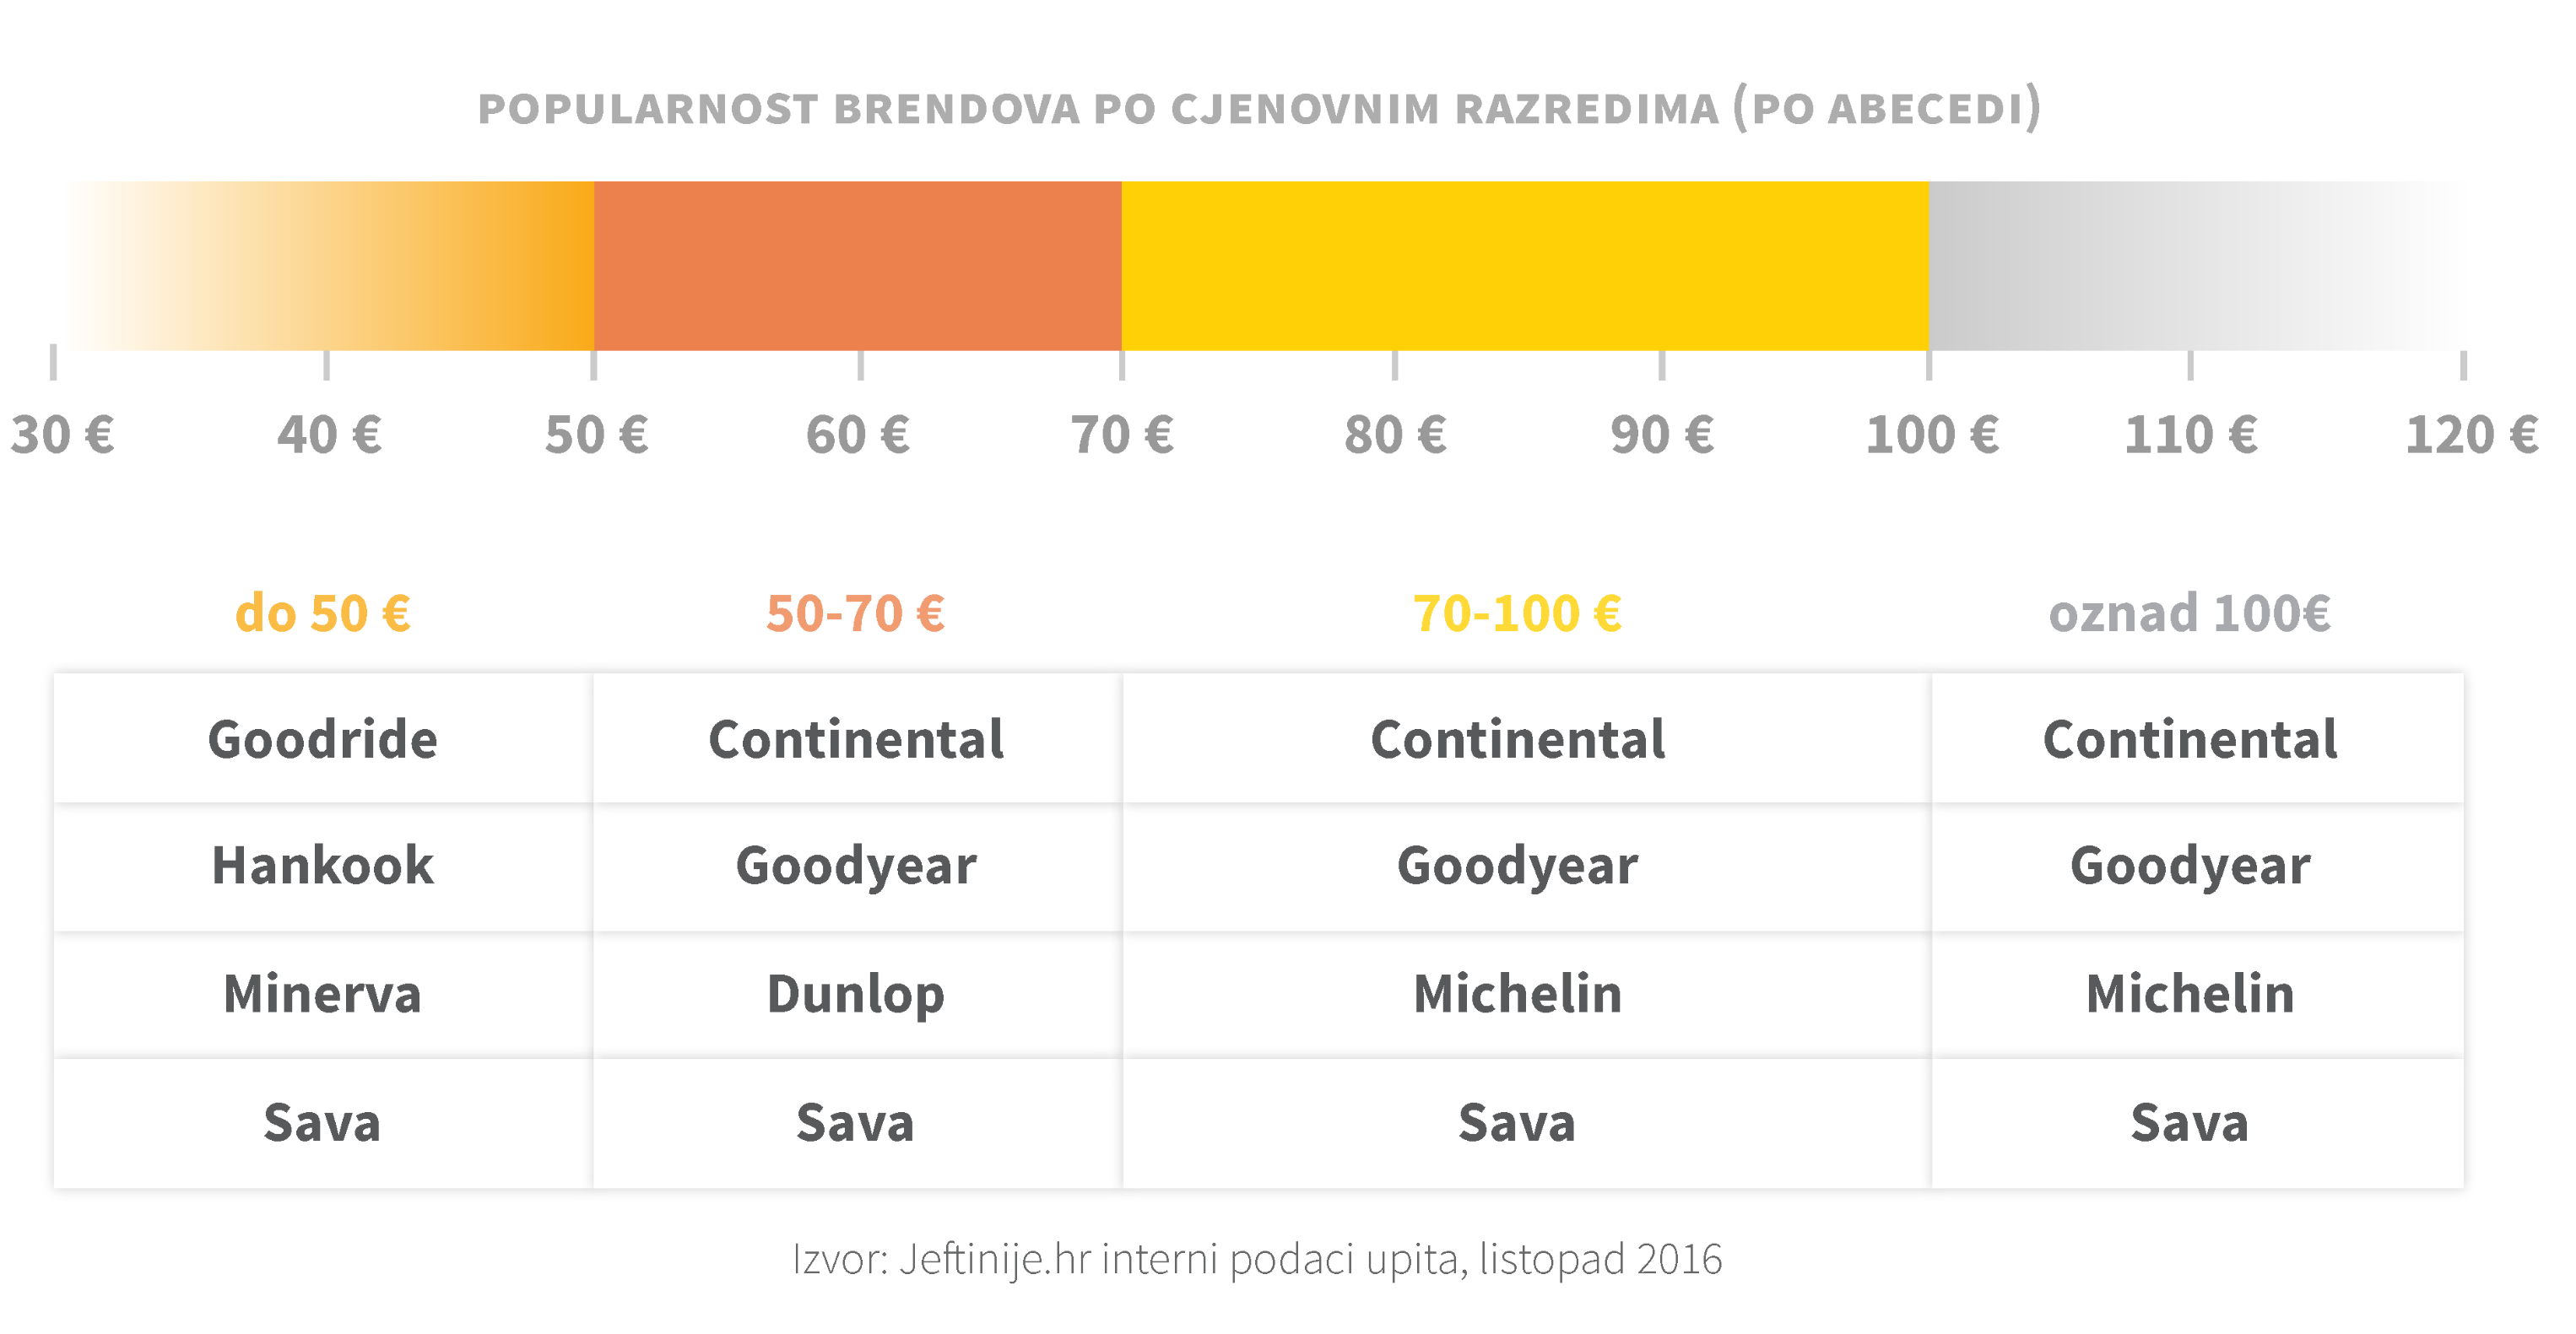 trendkiwi_graf-popularnost-brendova